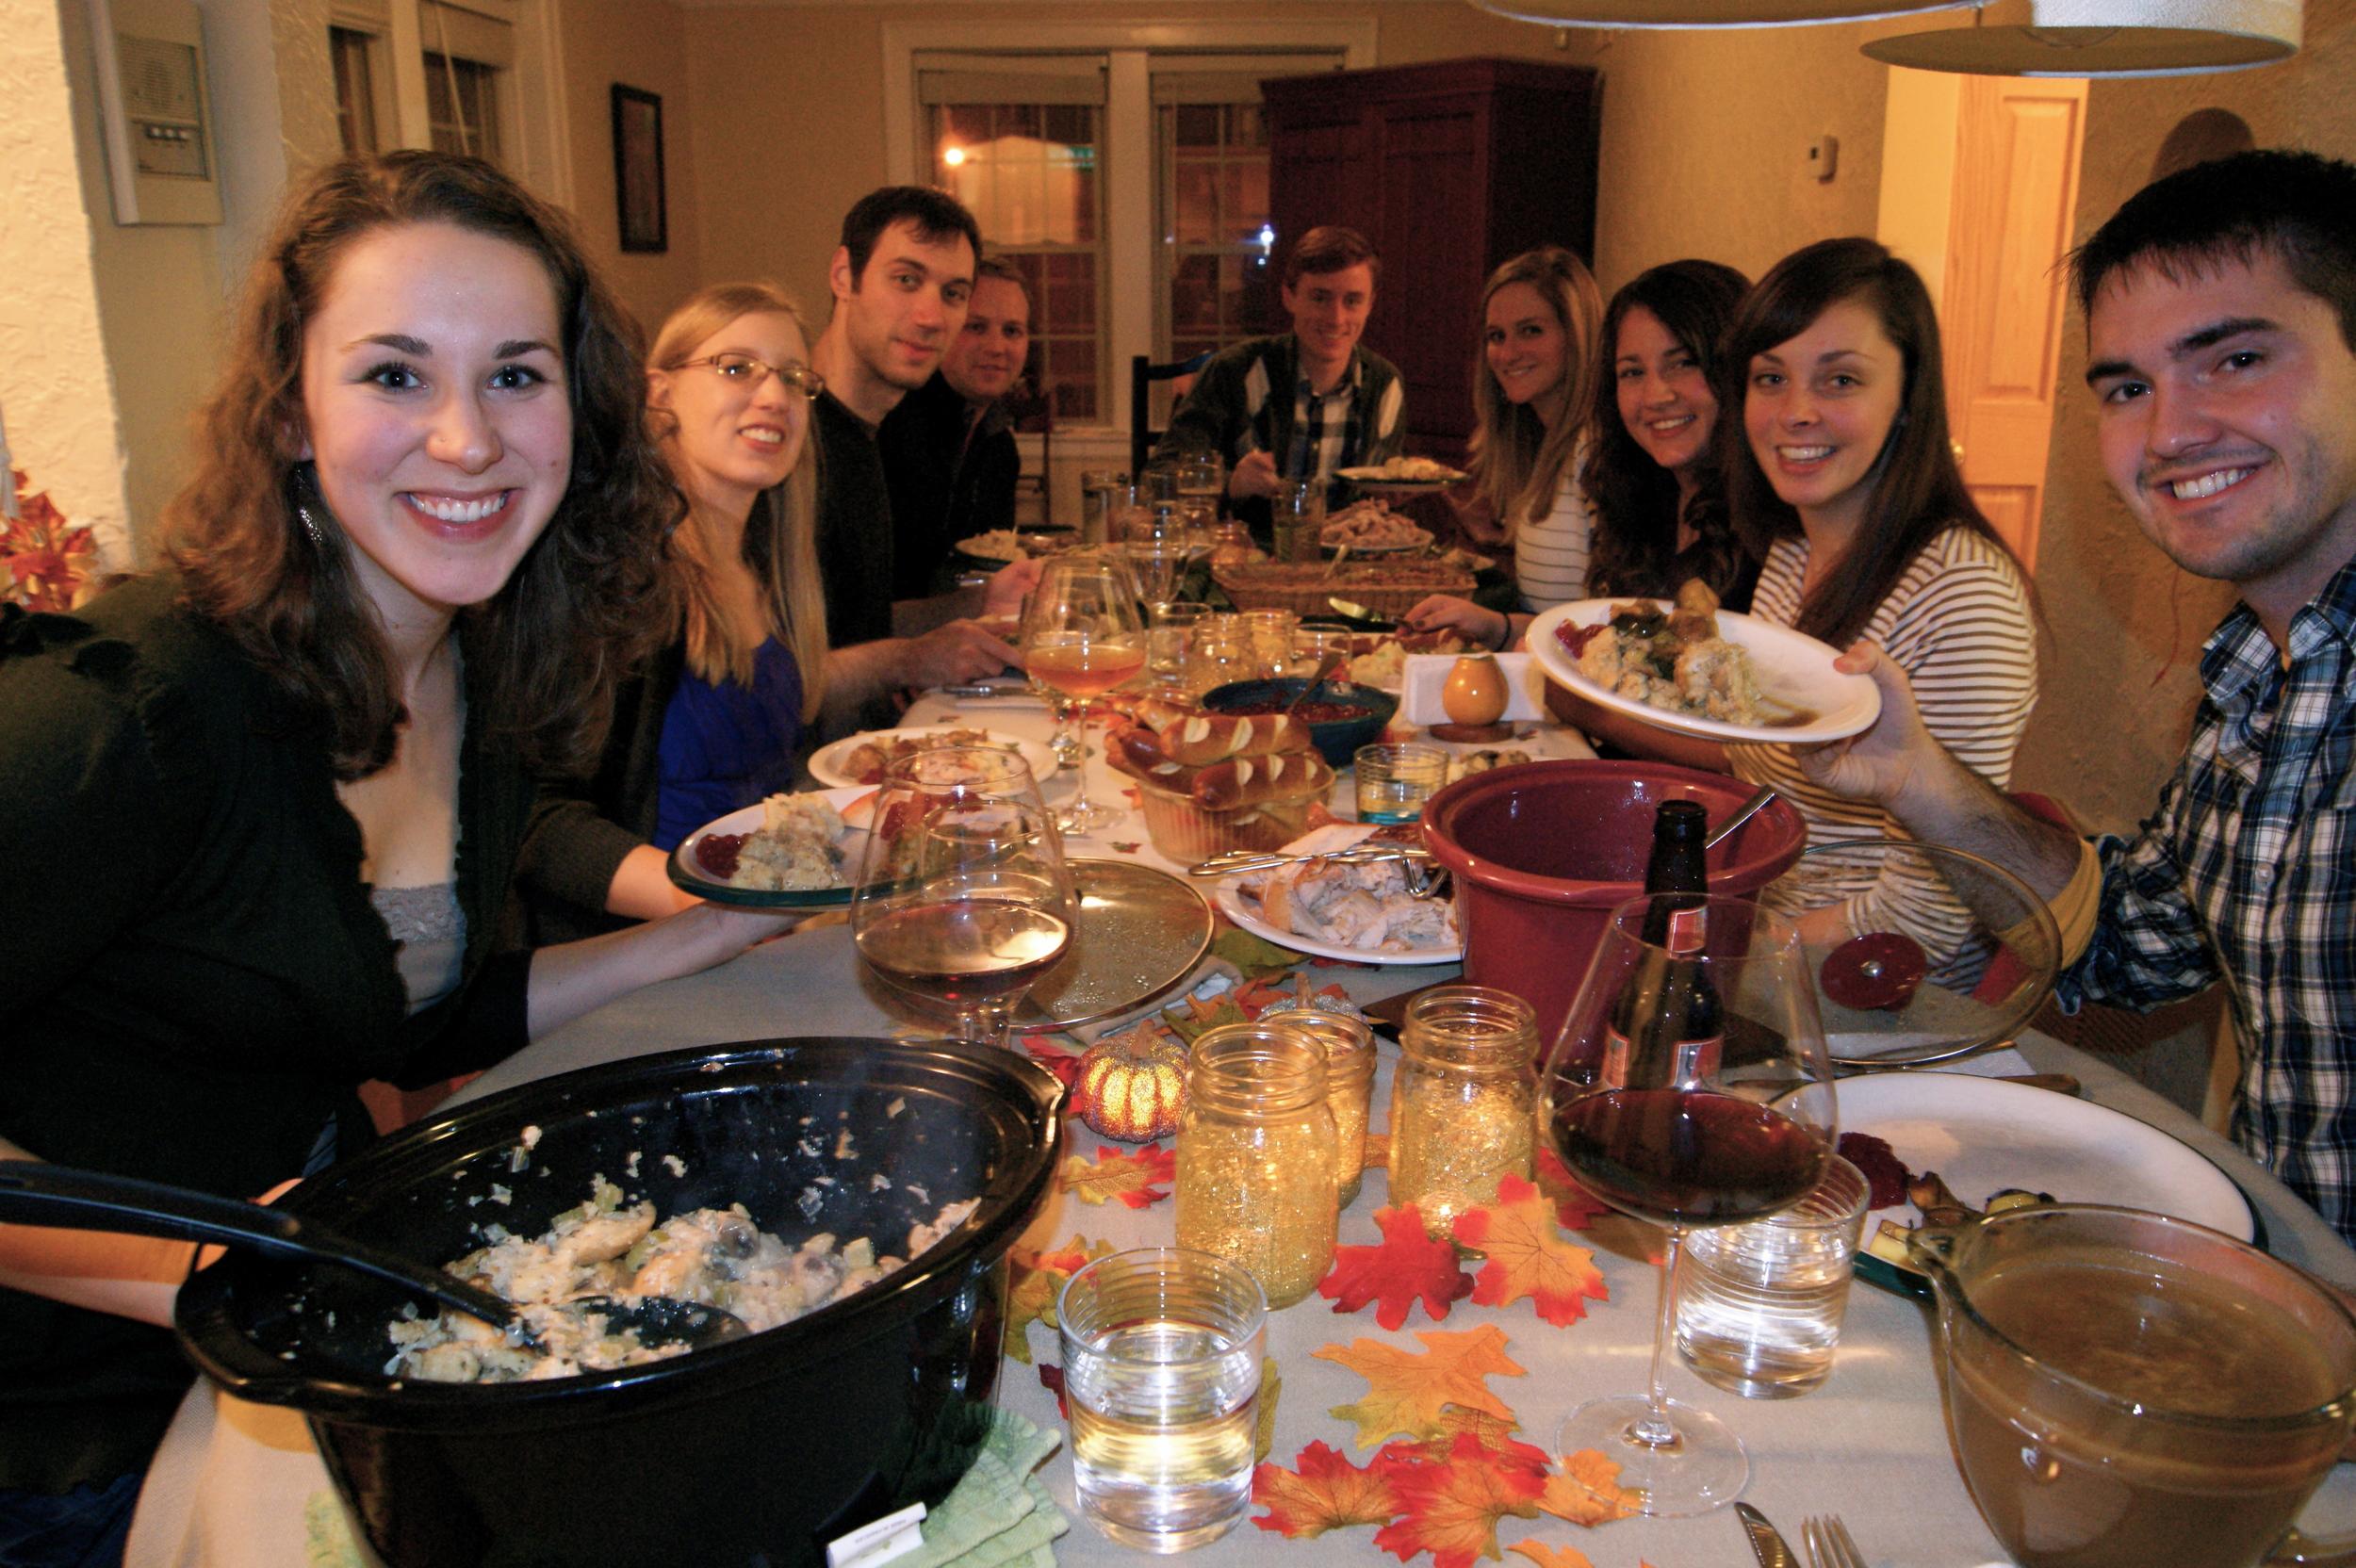 Second annual friendsgiving